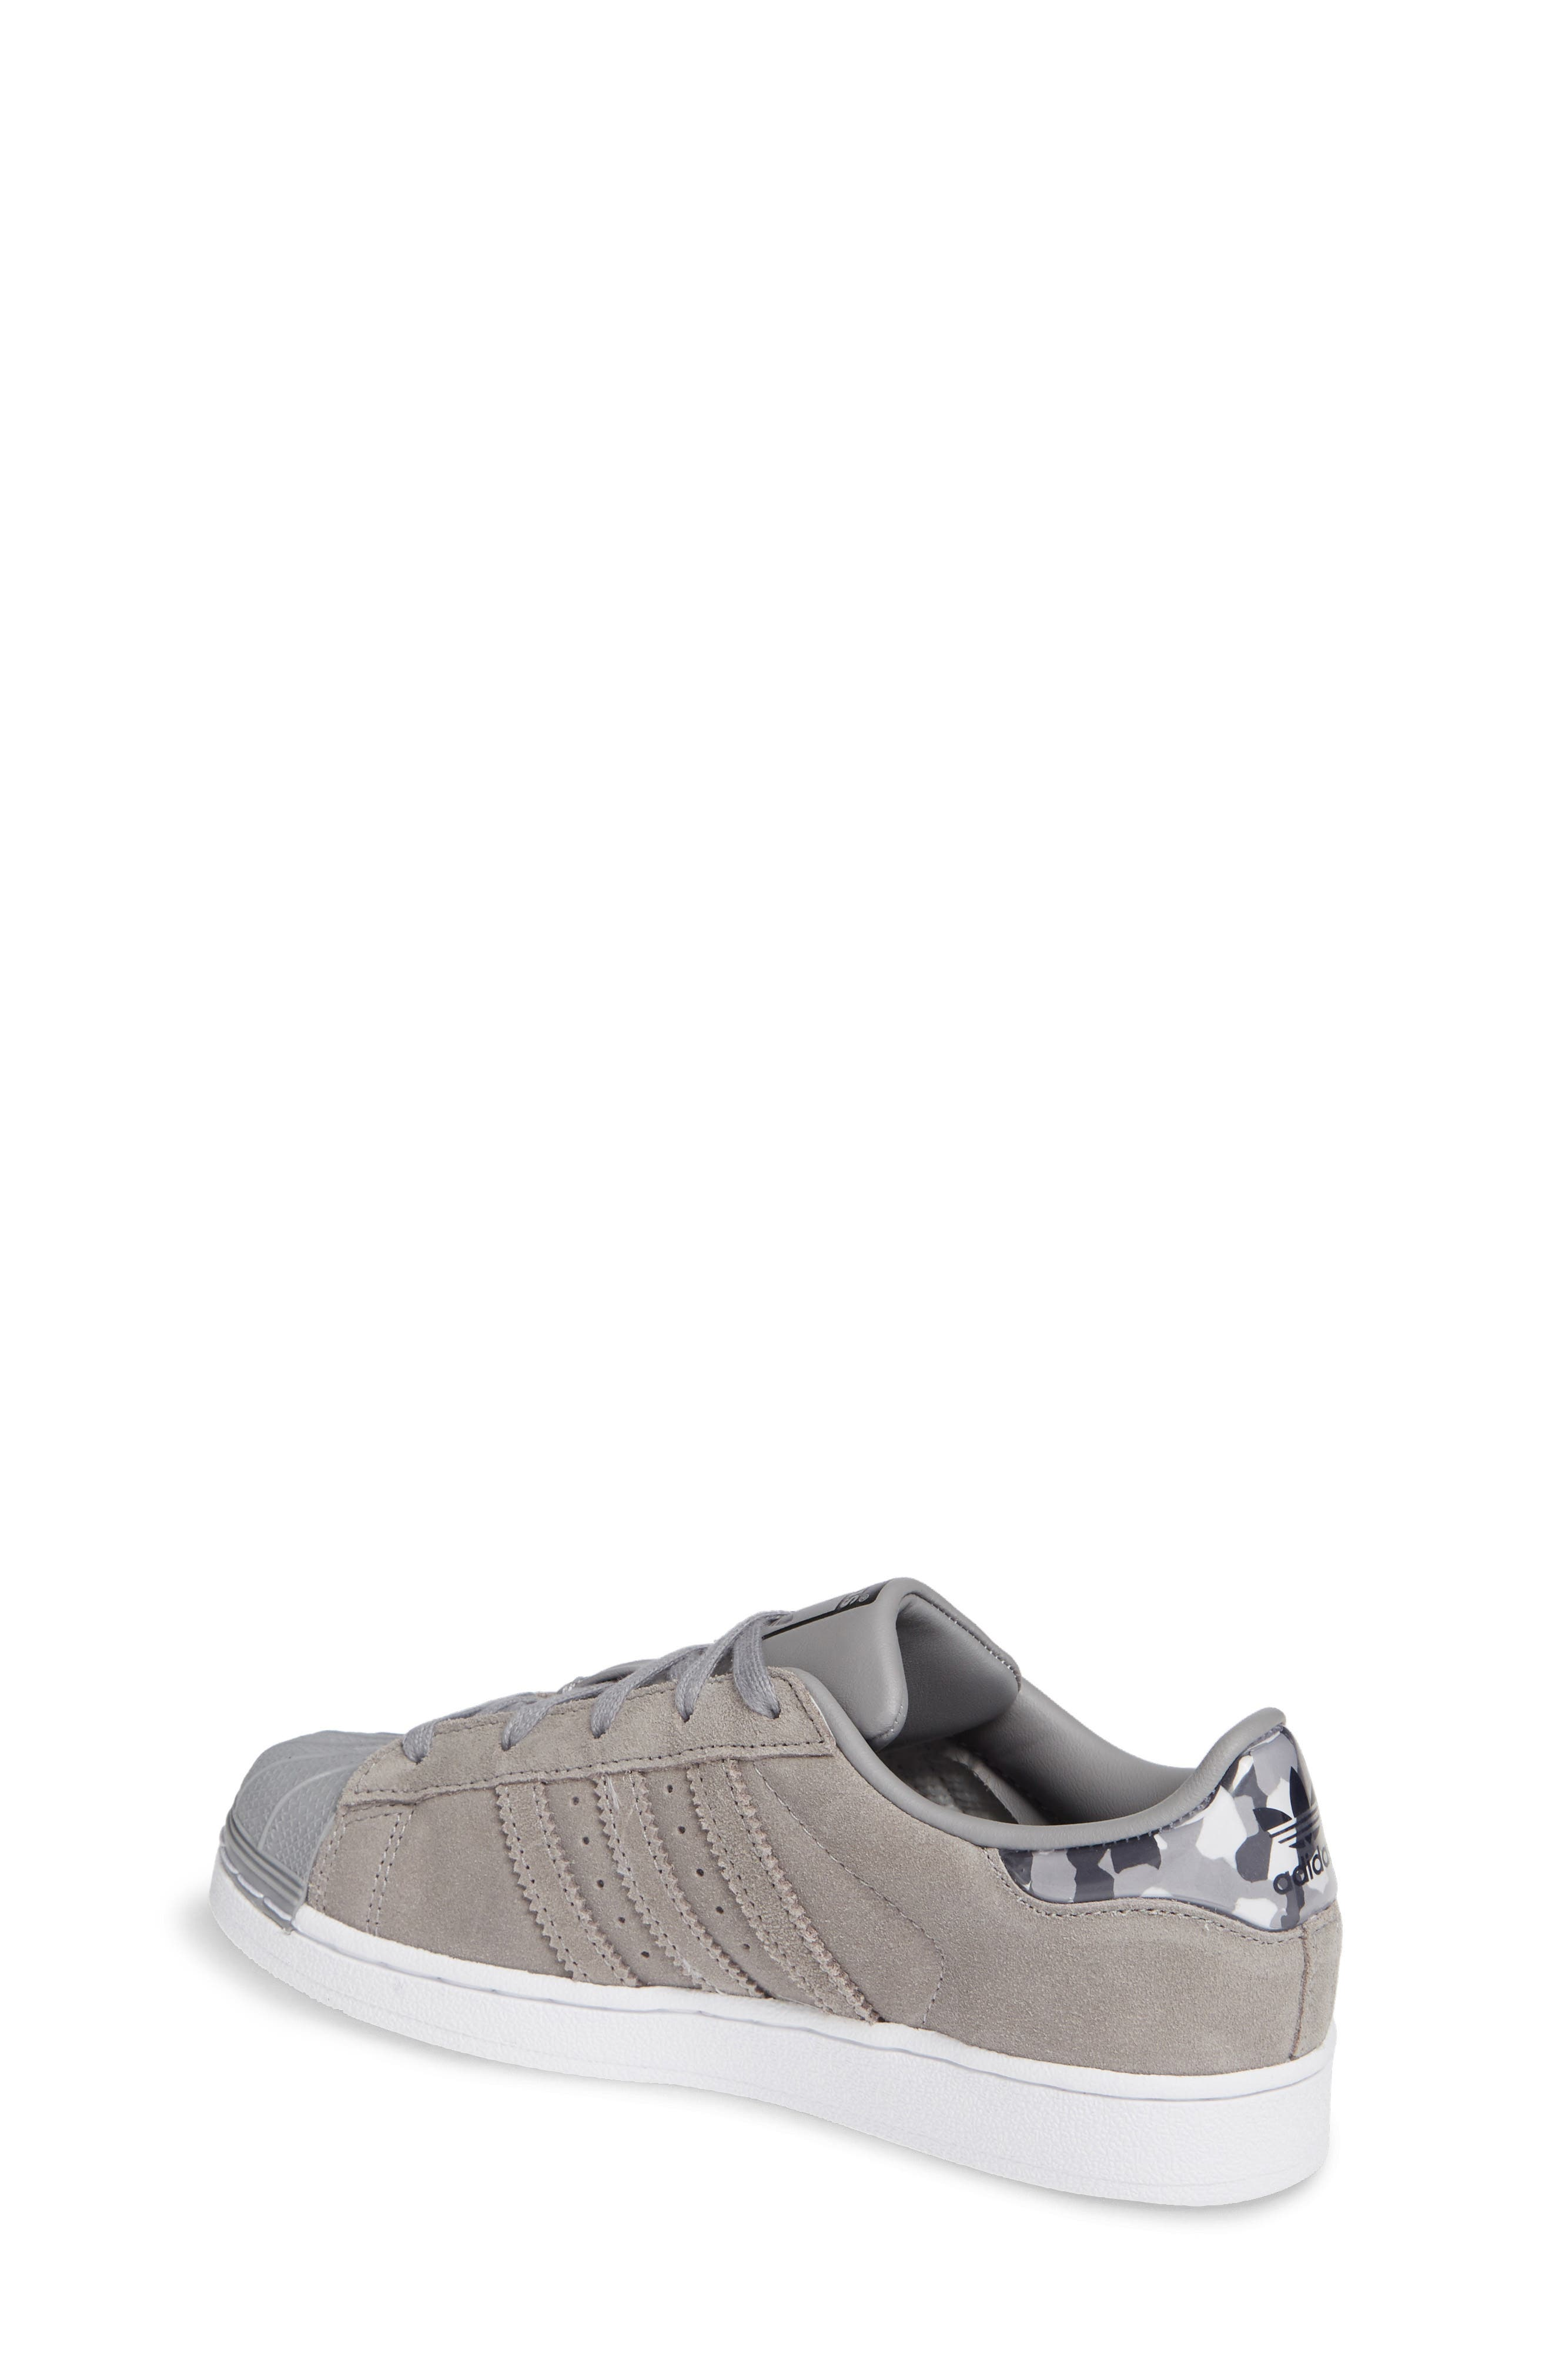 Superstar Low Top Sneaker,                             Alternate thumbnail 2, color,                             020